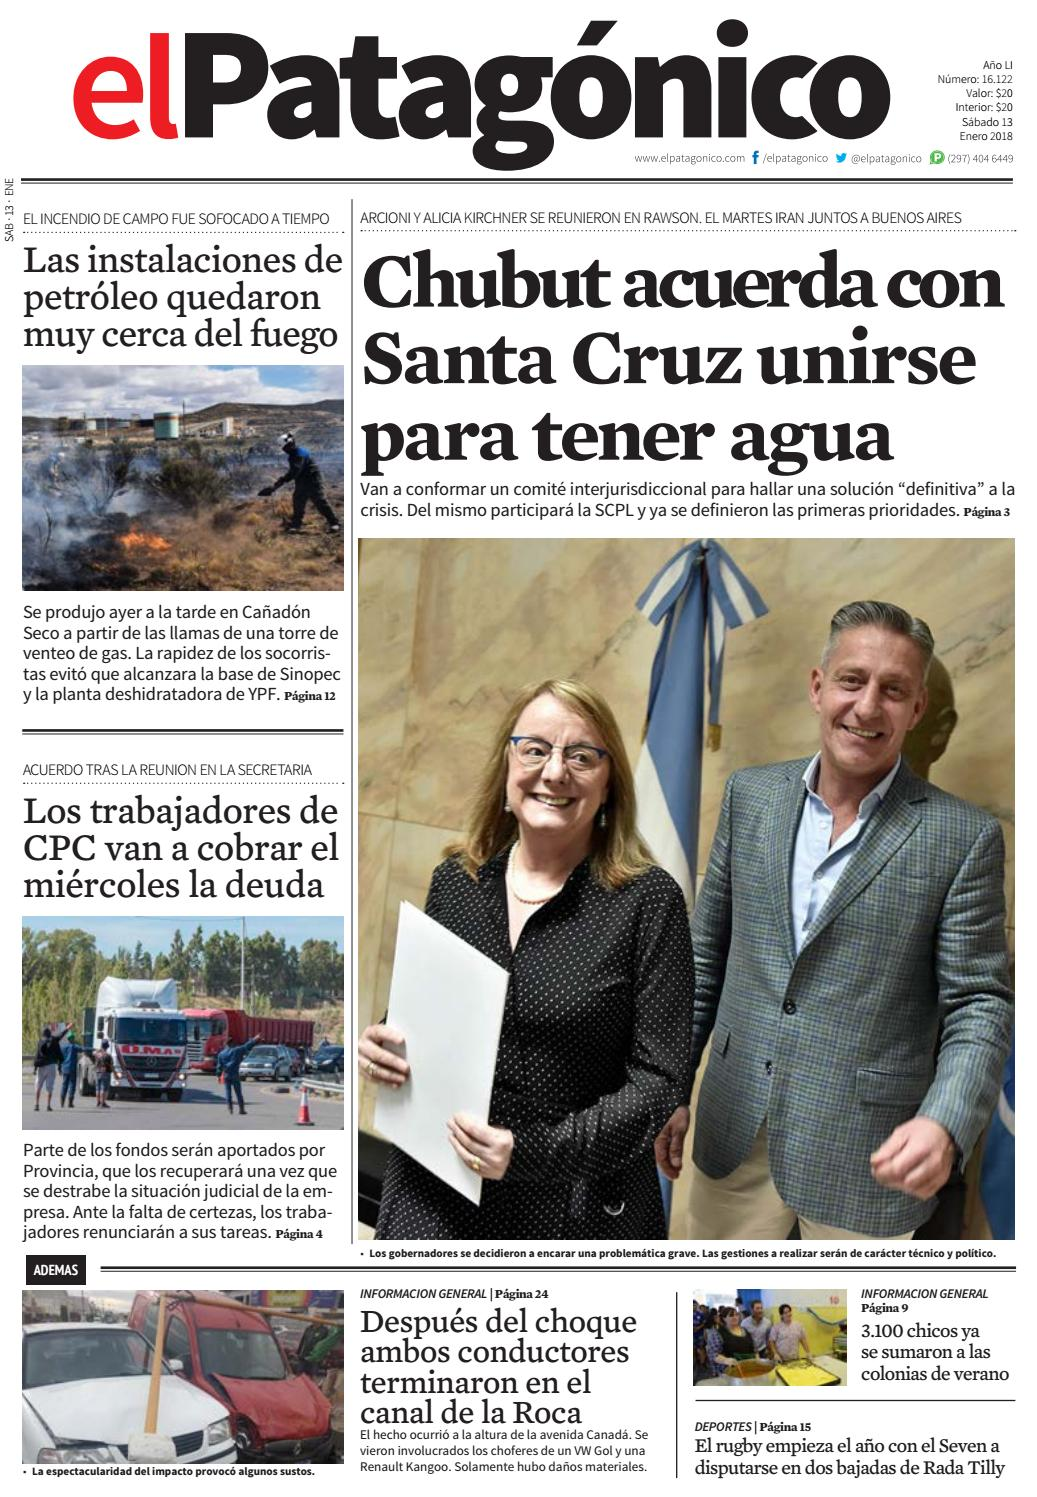 edicion214612012018.pdf by El Patagonico - issuu